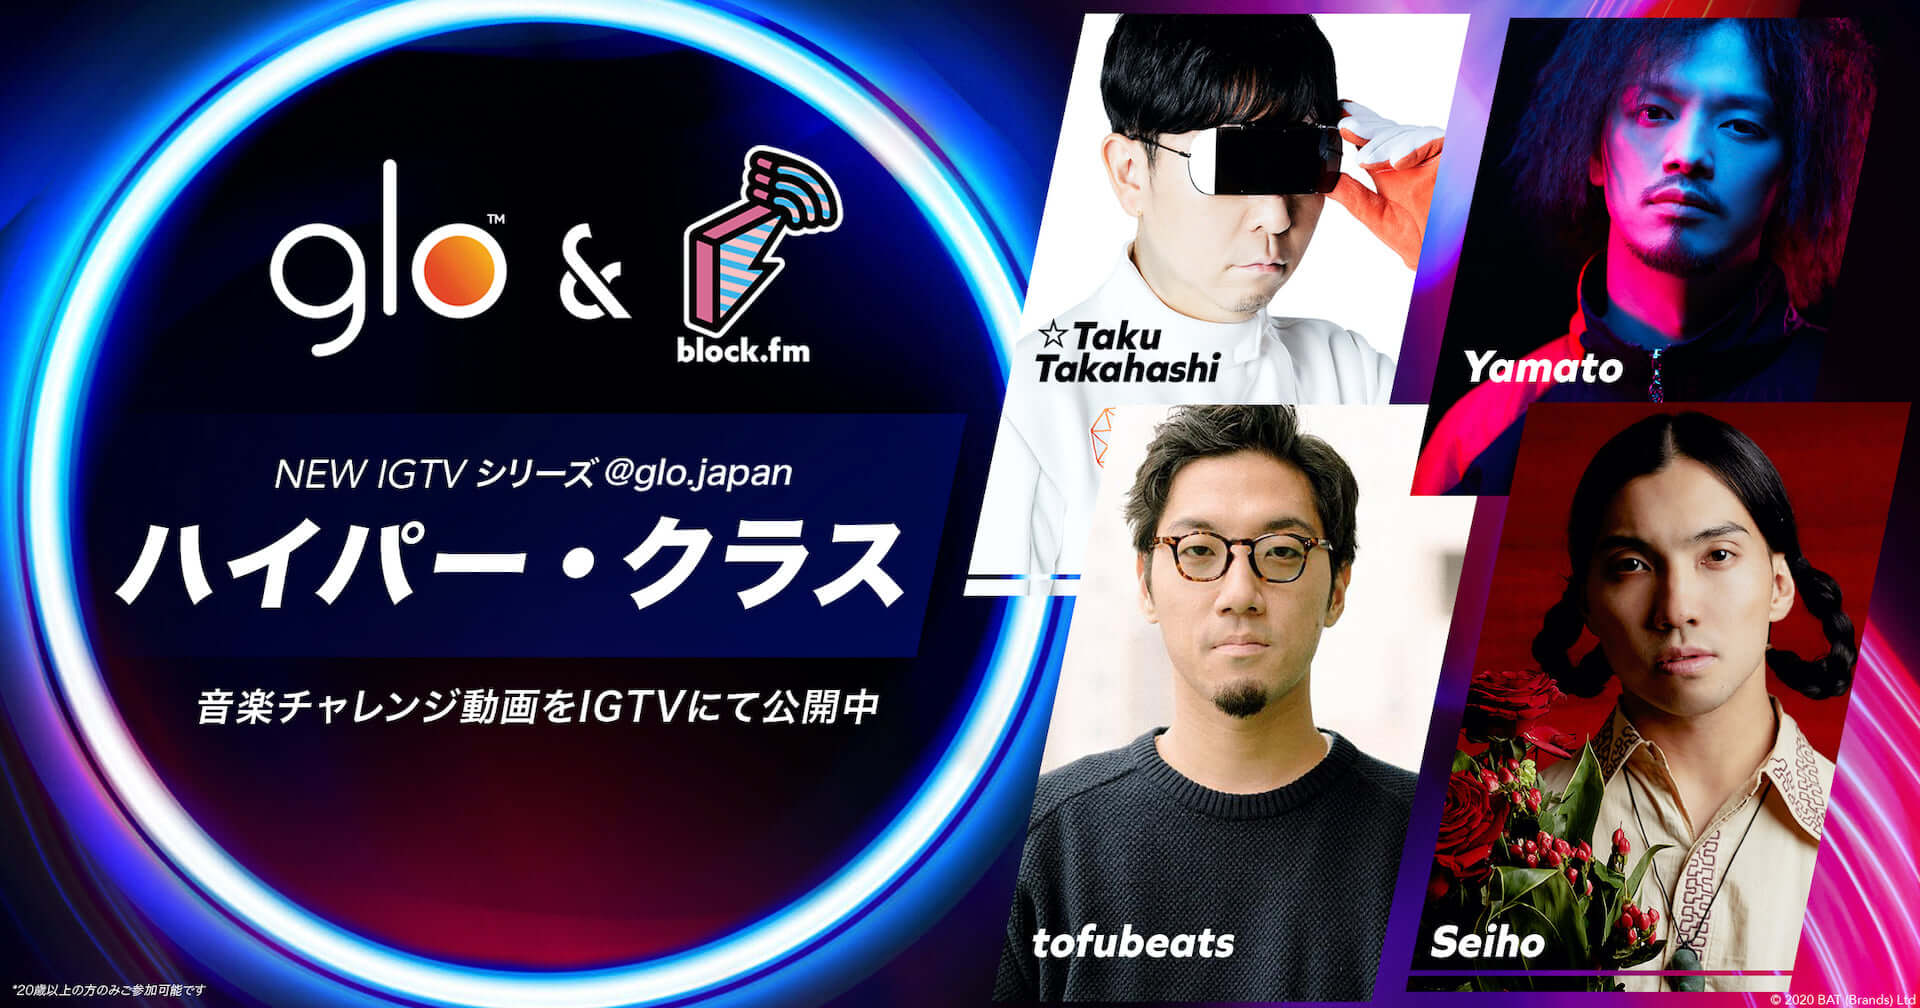 Seiho、tofubeats、Yamato、☆Taku Takahashiが様々なお題に挑戦!glo™とblock.fmが贈る動画シリーズが公開 music200916_glo-blockfm_1-1920x1008